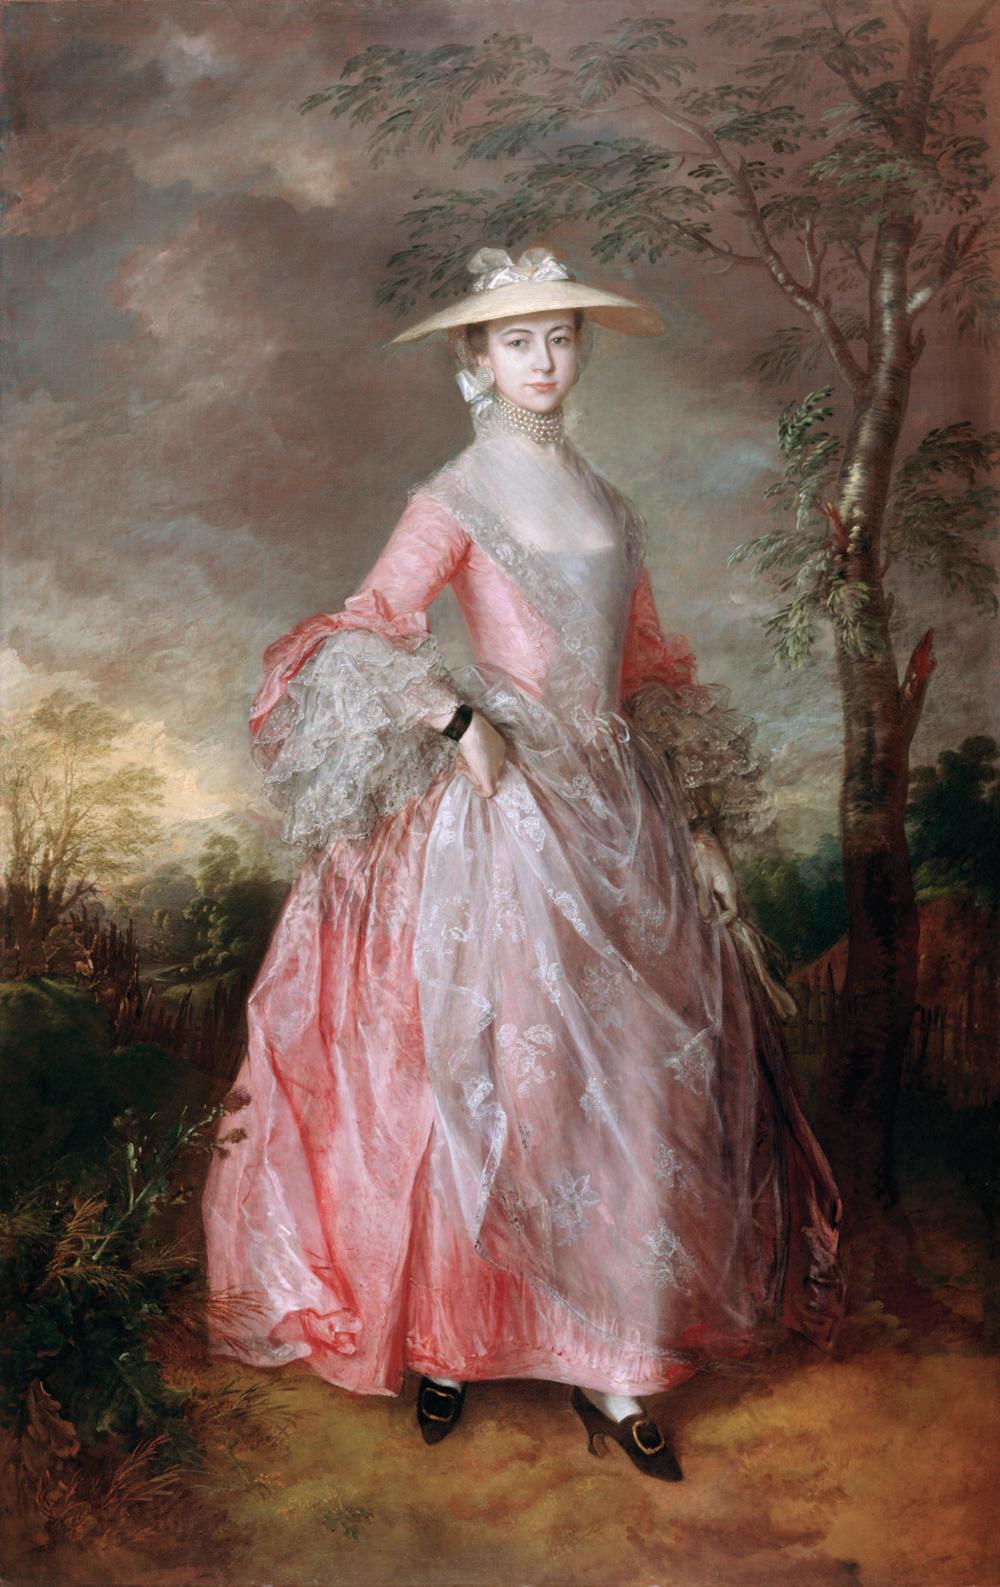 http://upload.wikimedia.org/wikipedia/commons/4/43/Thomas_Gainsborough_-_Mary%2C_Countess_of_Howe_-_WGA08407.jpg